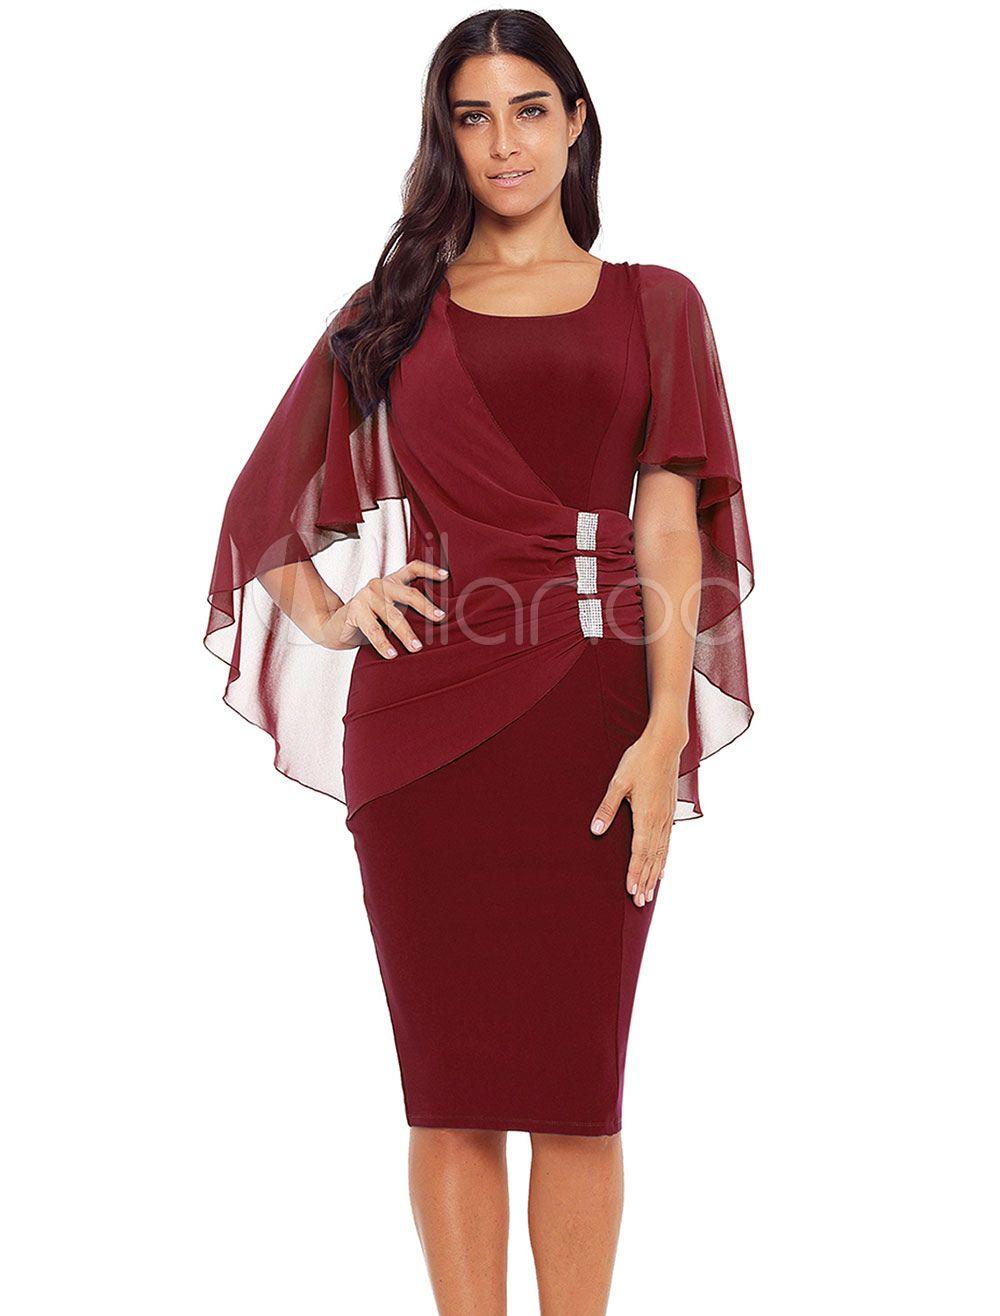 e92fde85047 Women Bodycon Dress Half Sleeve Midi Dress U Neck Ruched Rhinestones  Shaping Party Dress  Sleeve